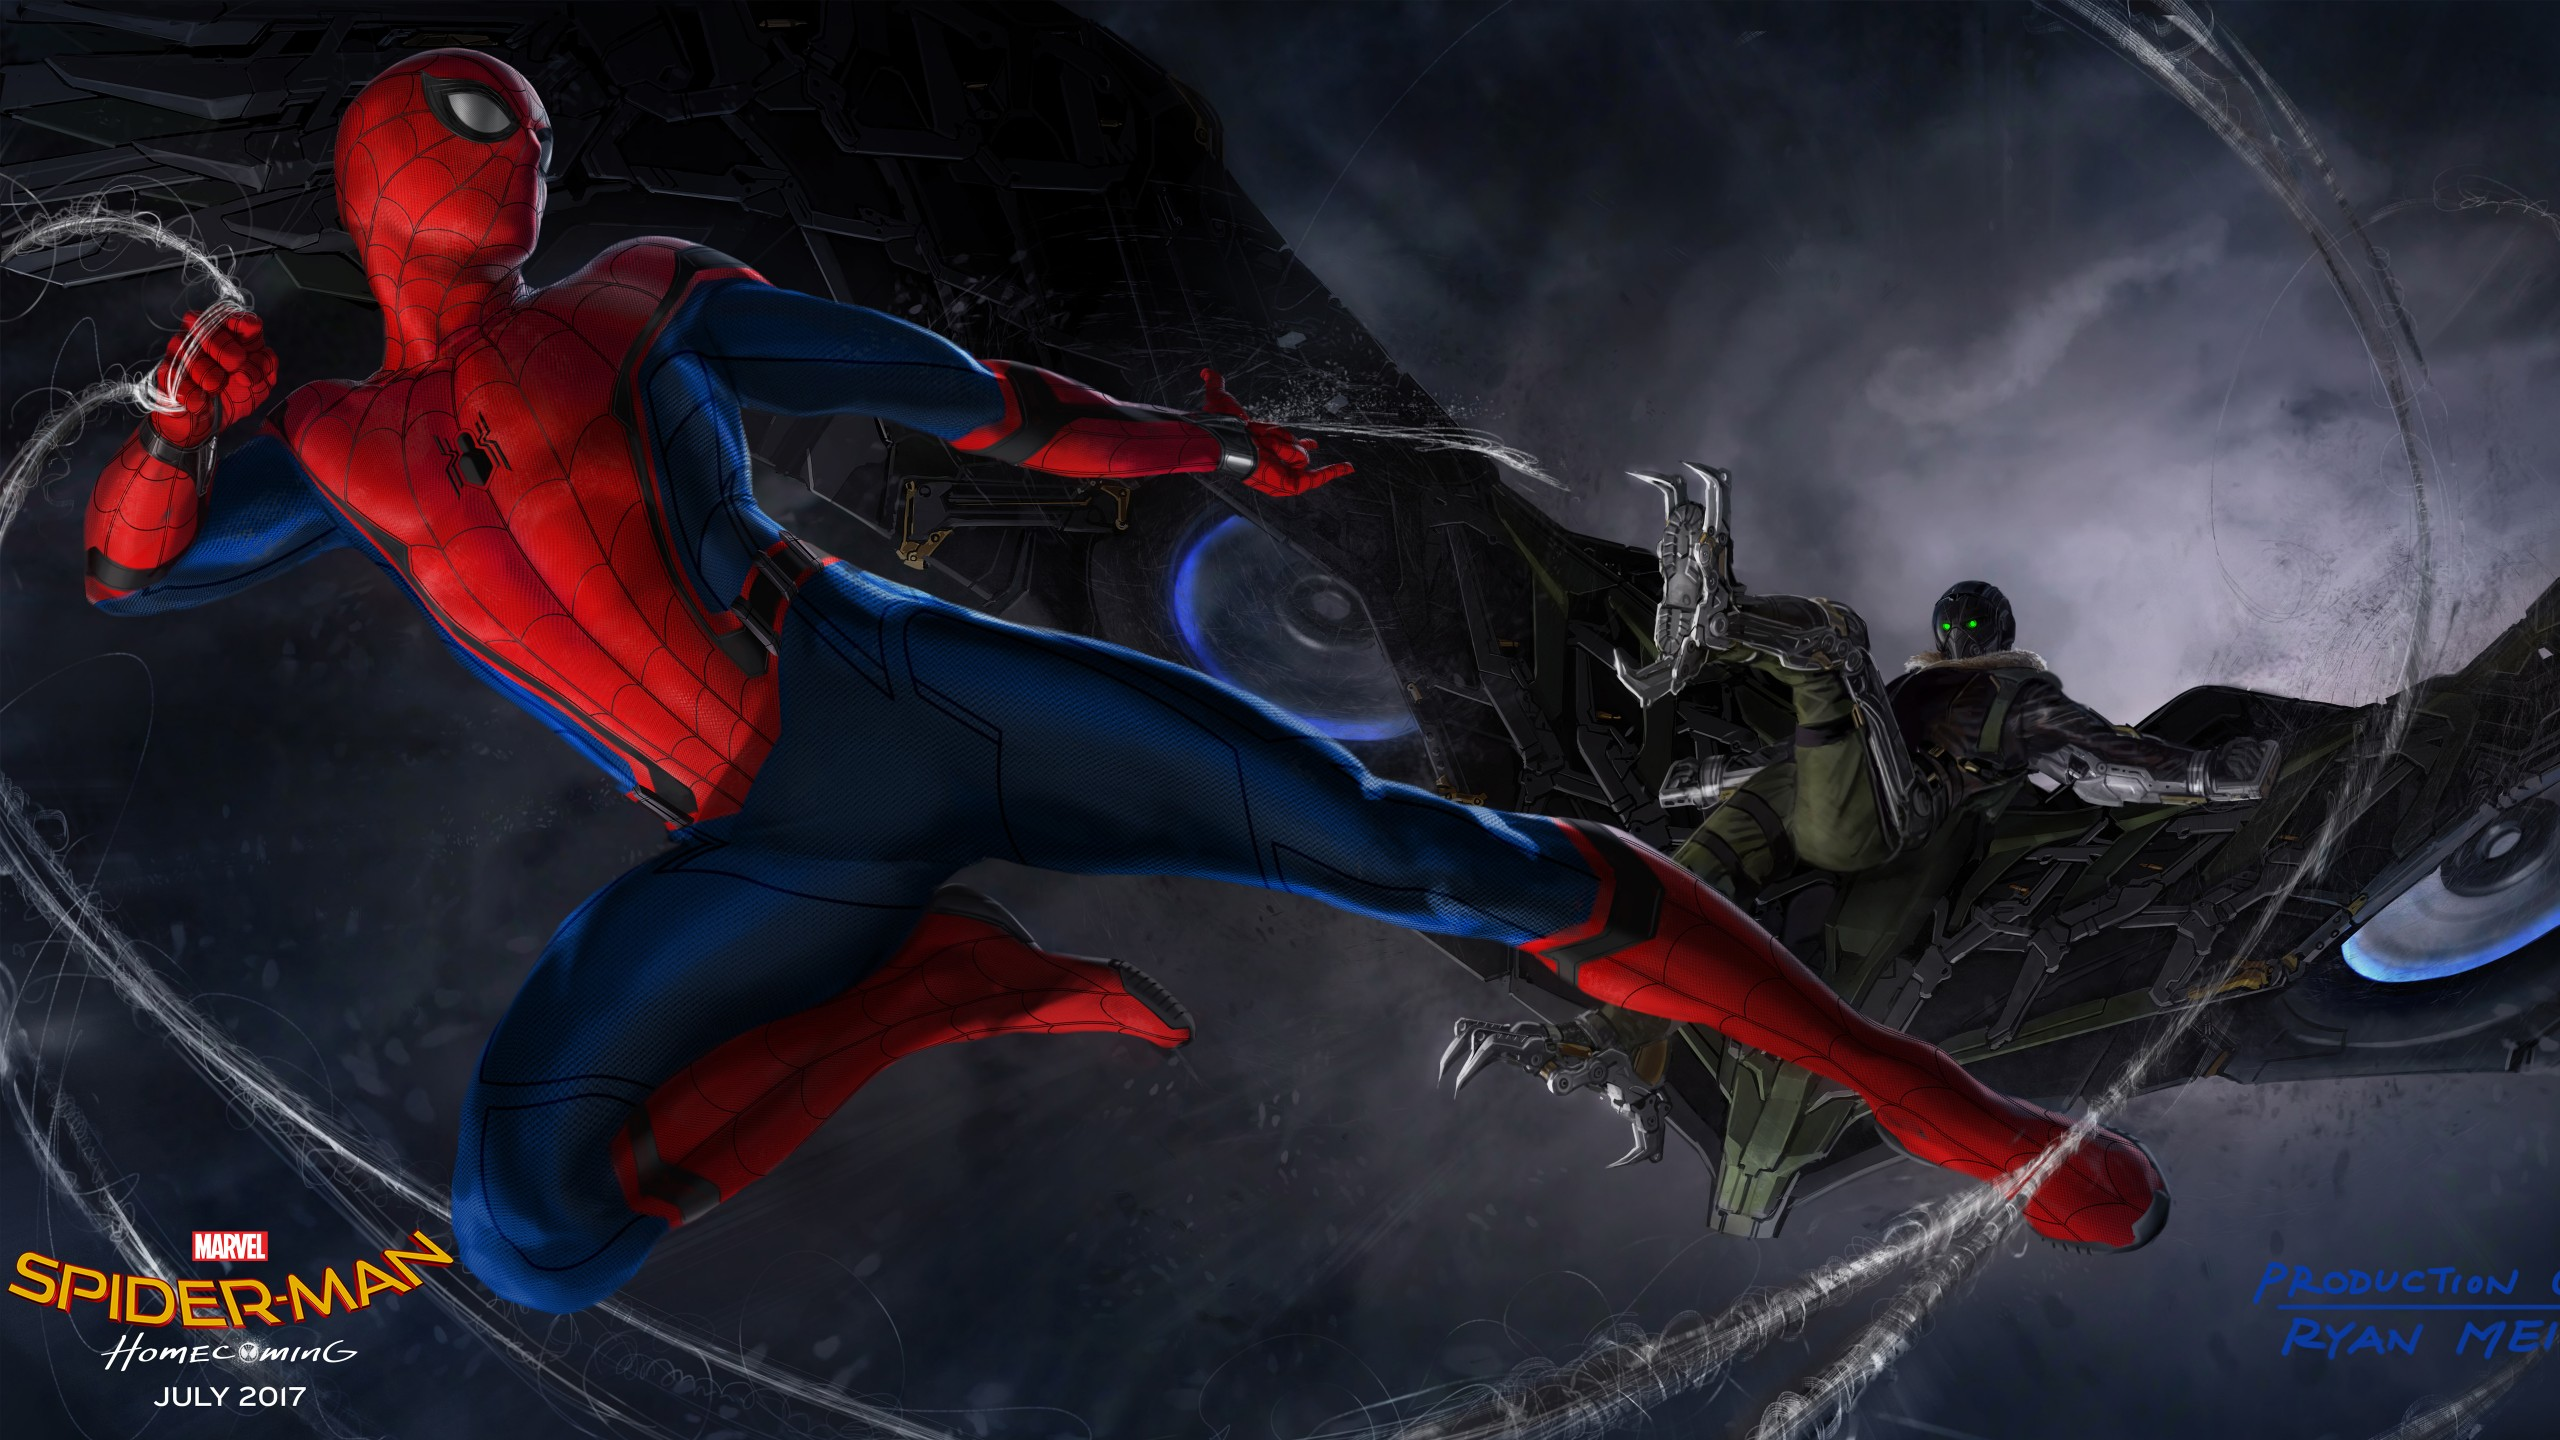 spider-man-homecoming-4k-wallpaper-8